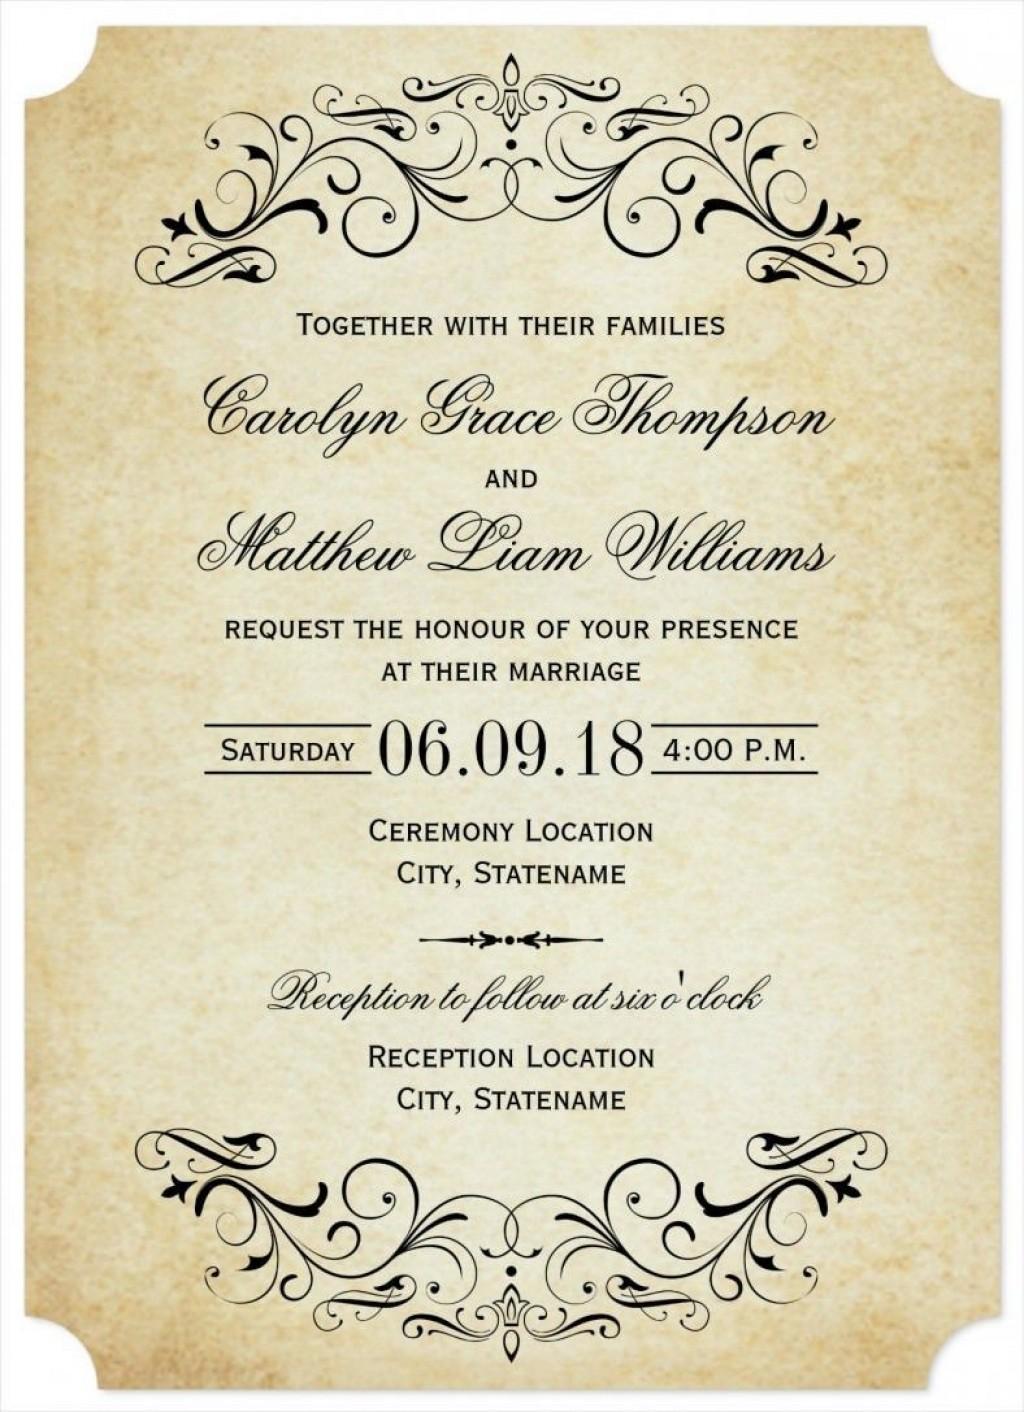 002 Wonderful Sample Wedding Invitation Template Highest Quality  Templates Wording CardLarge